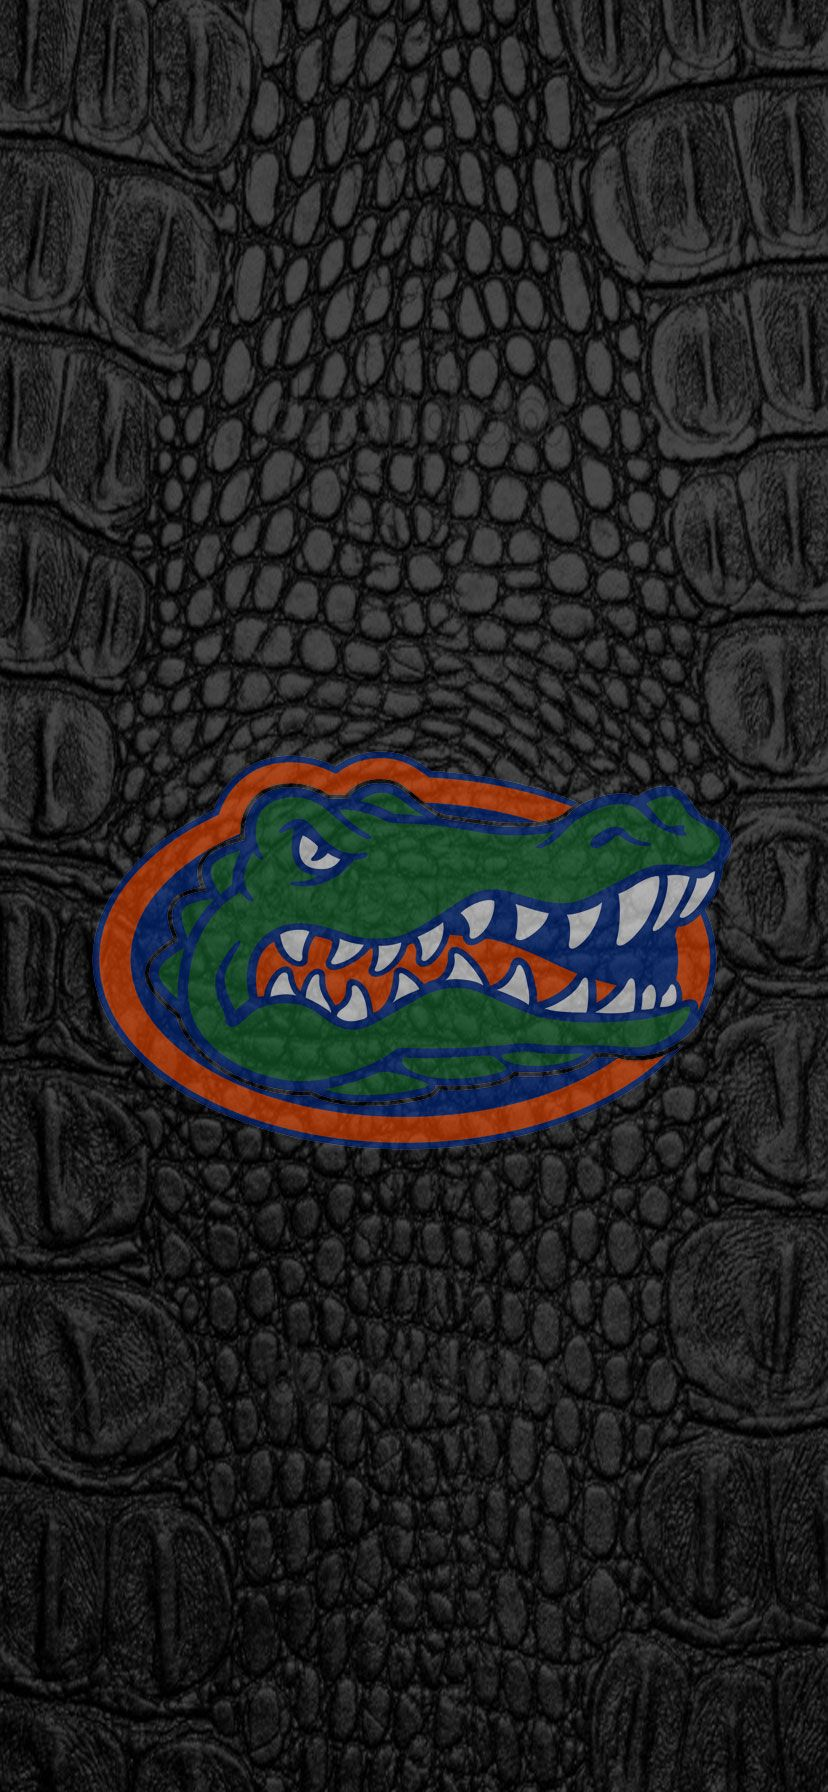 Pin by Karen Cabanas Voss on Florida Gators iPhone XR